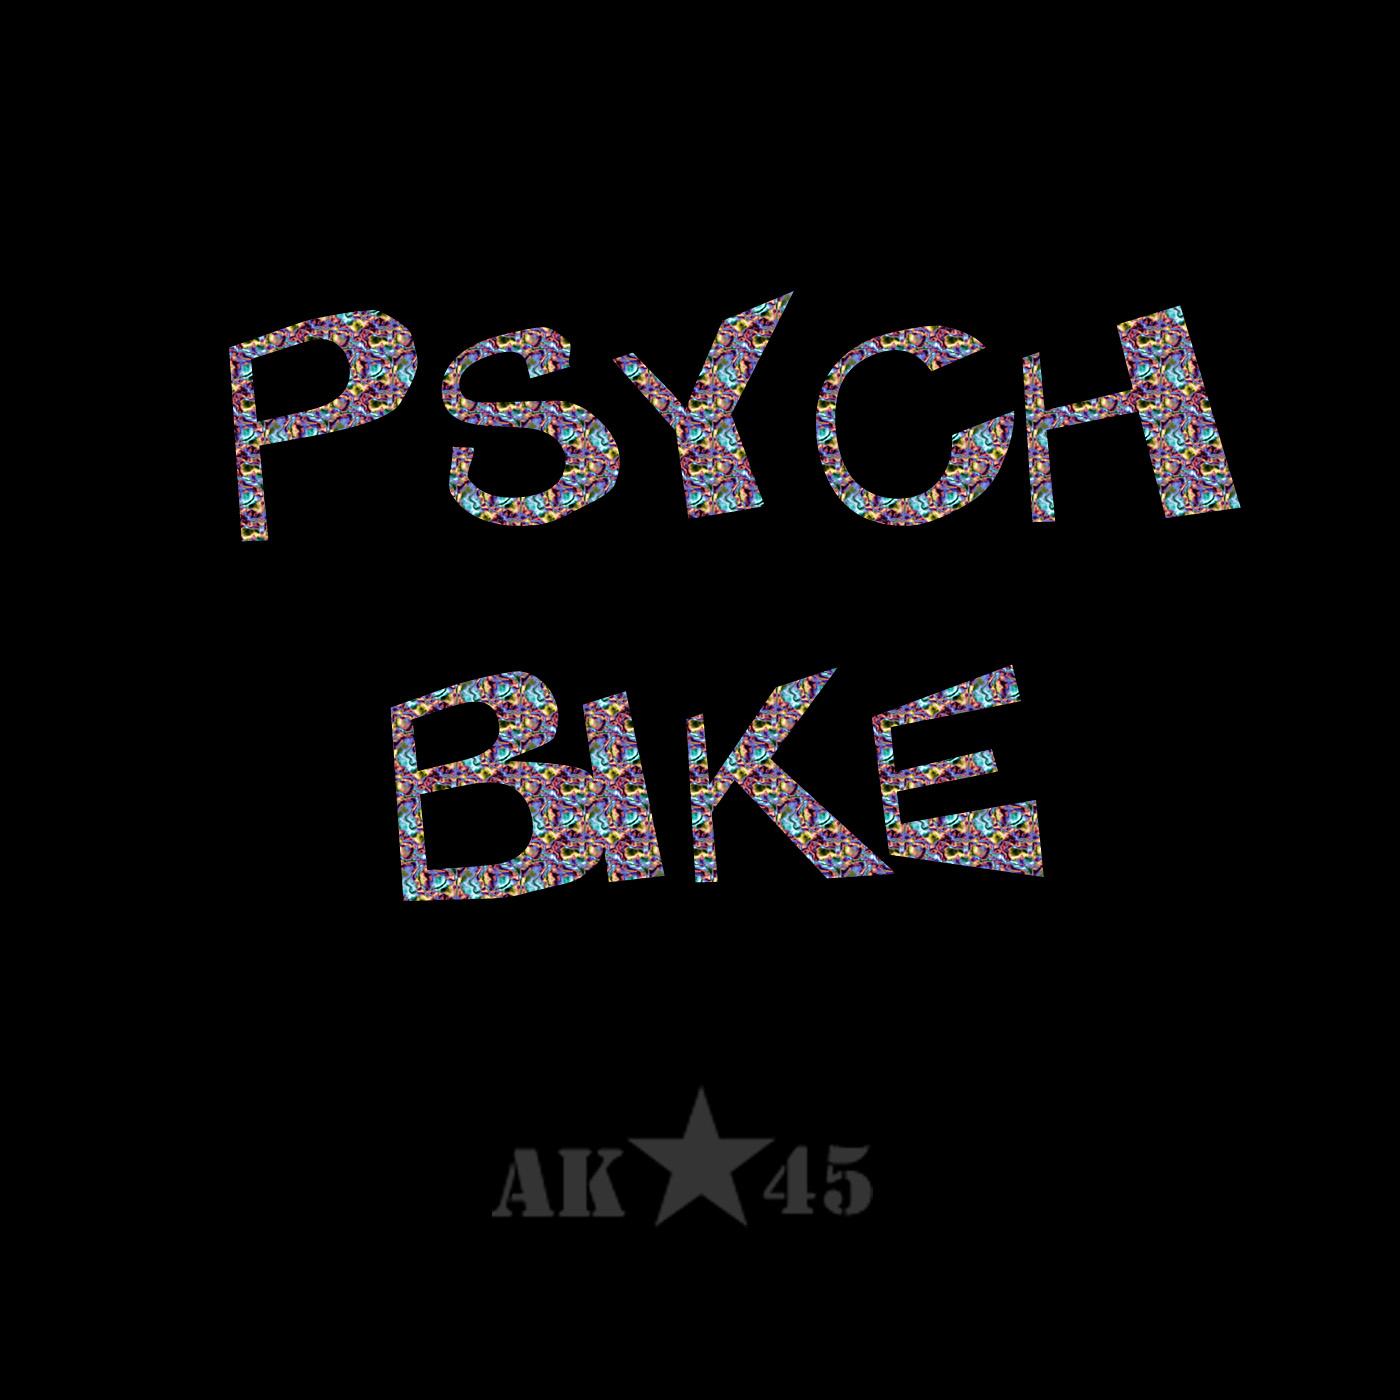 psych-bike-lg